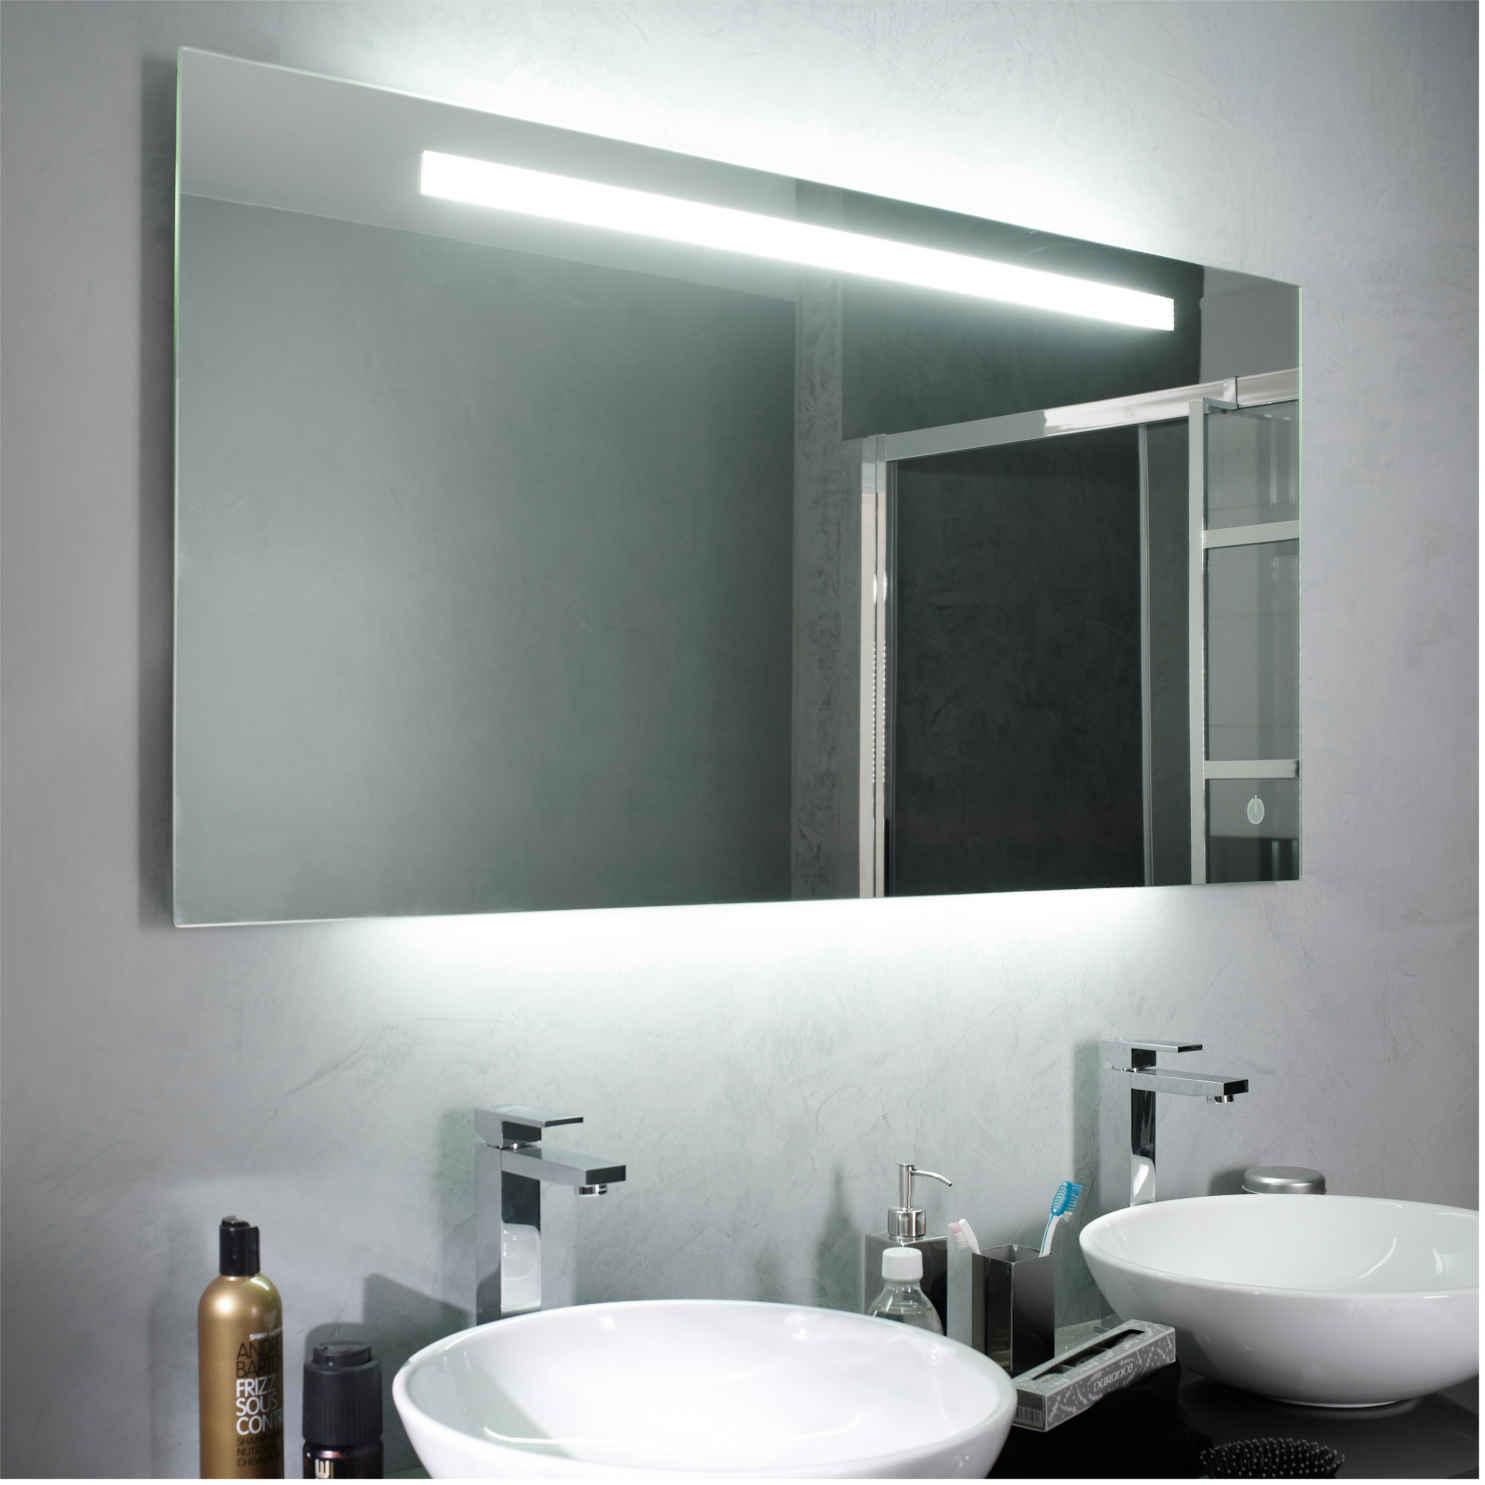 Pose Miroir Salle De Bain #15: Miroir Lumineux